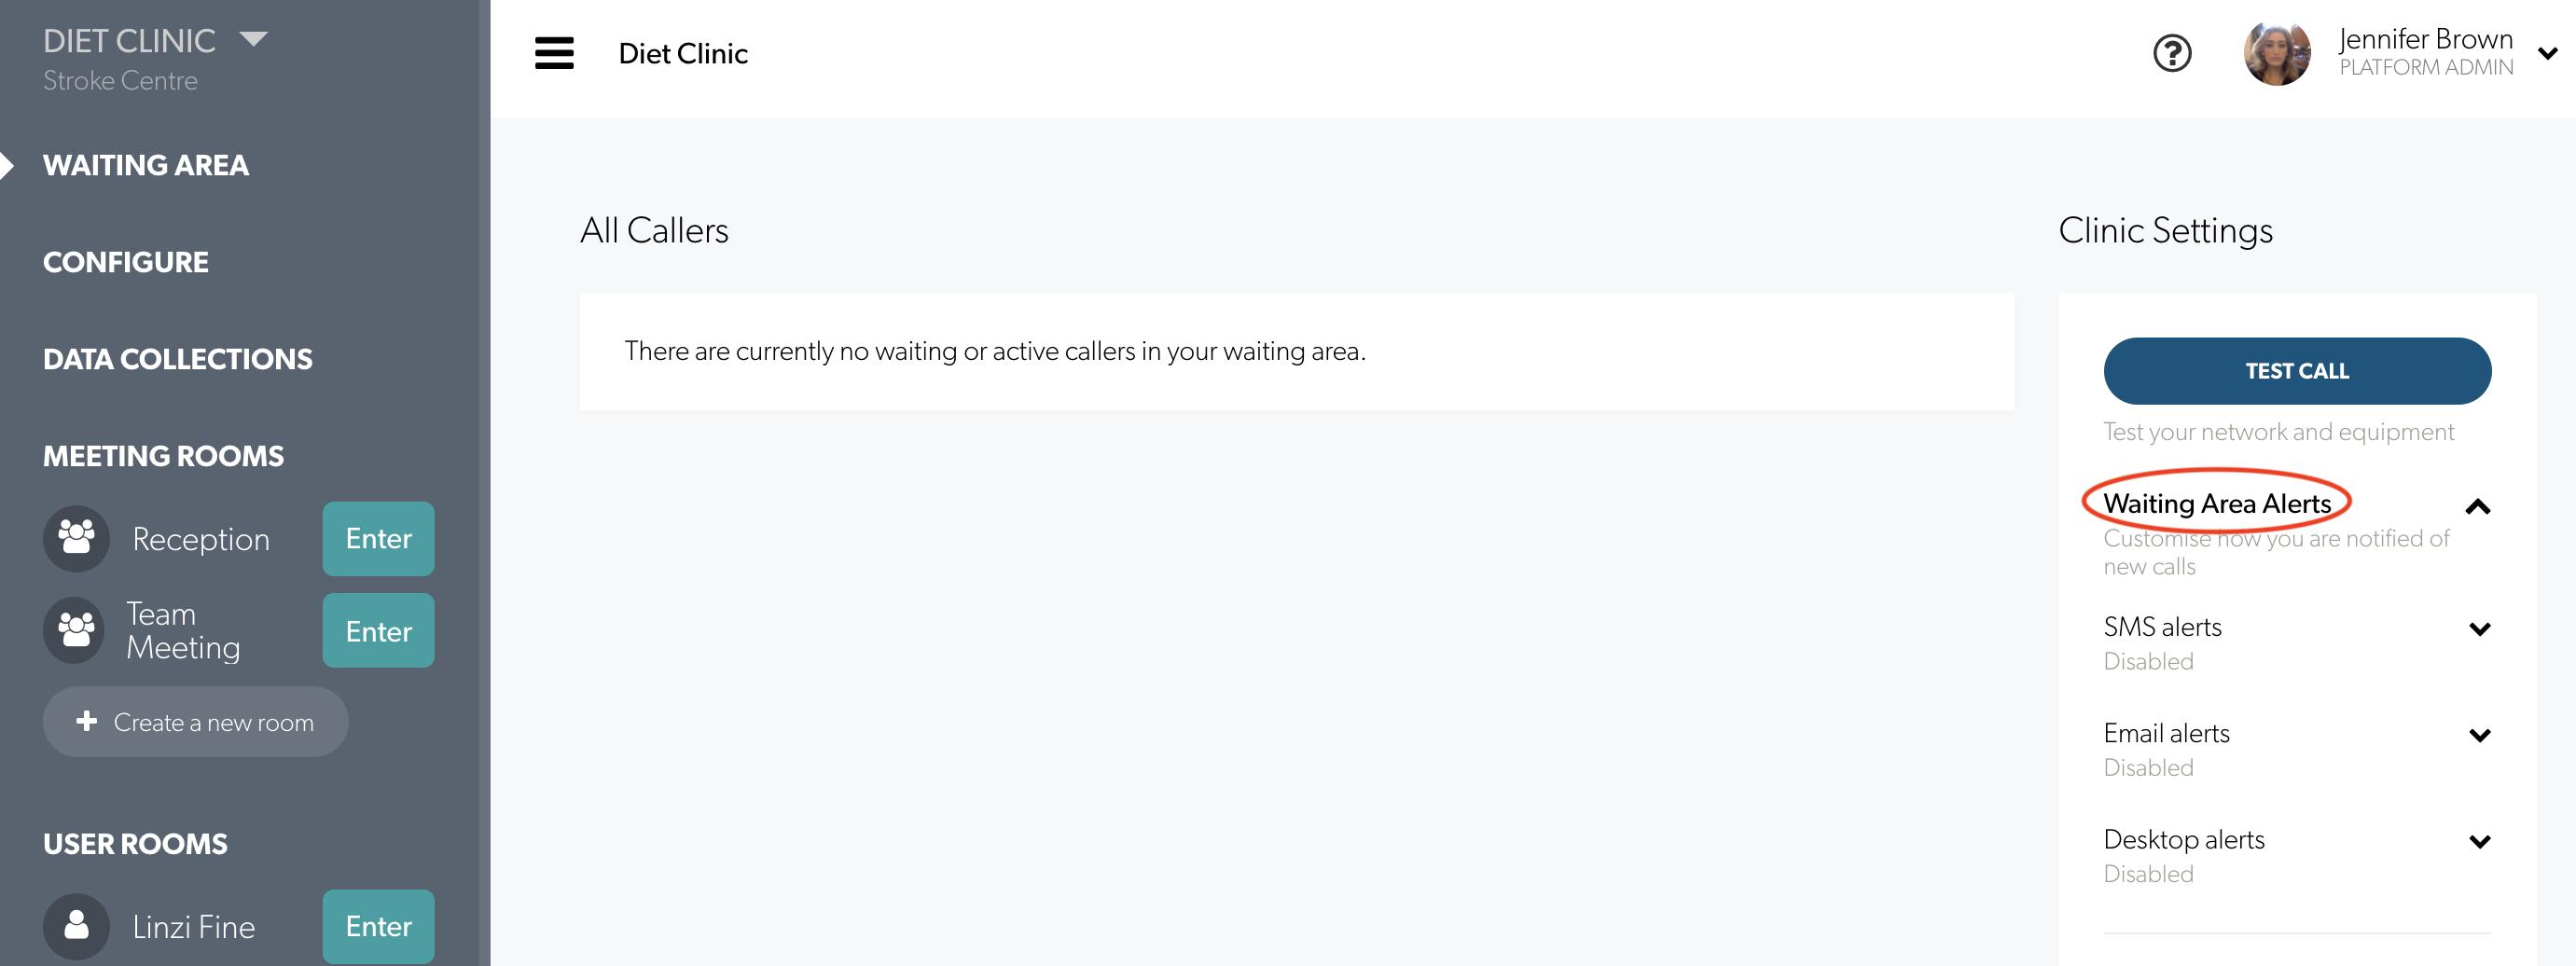 Enterprise Waiting Area Alerts